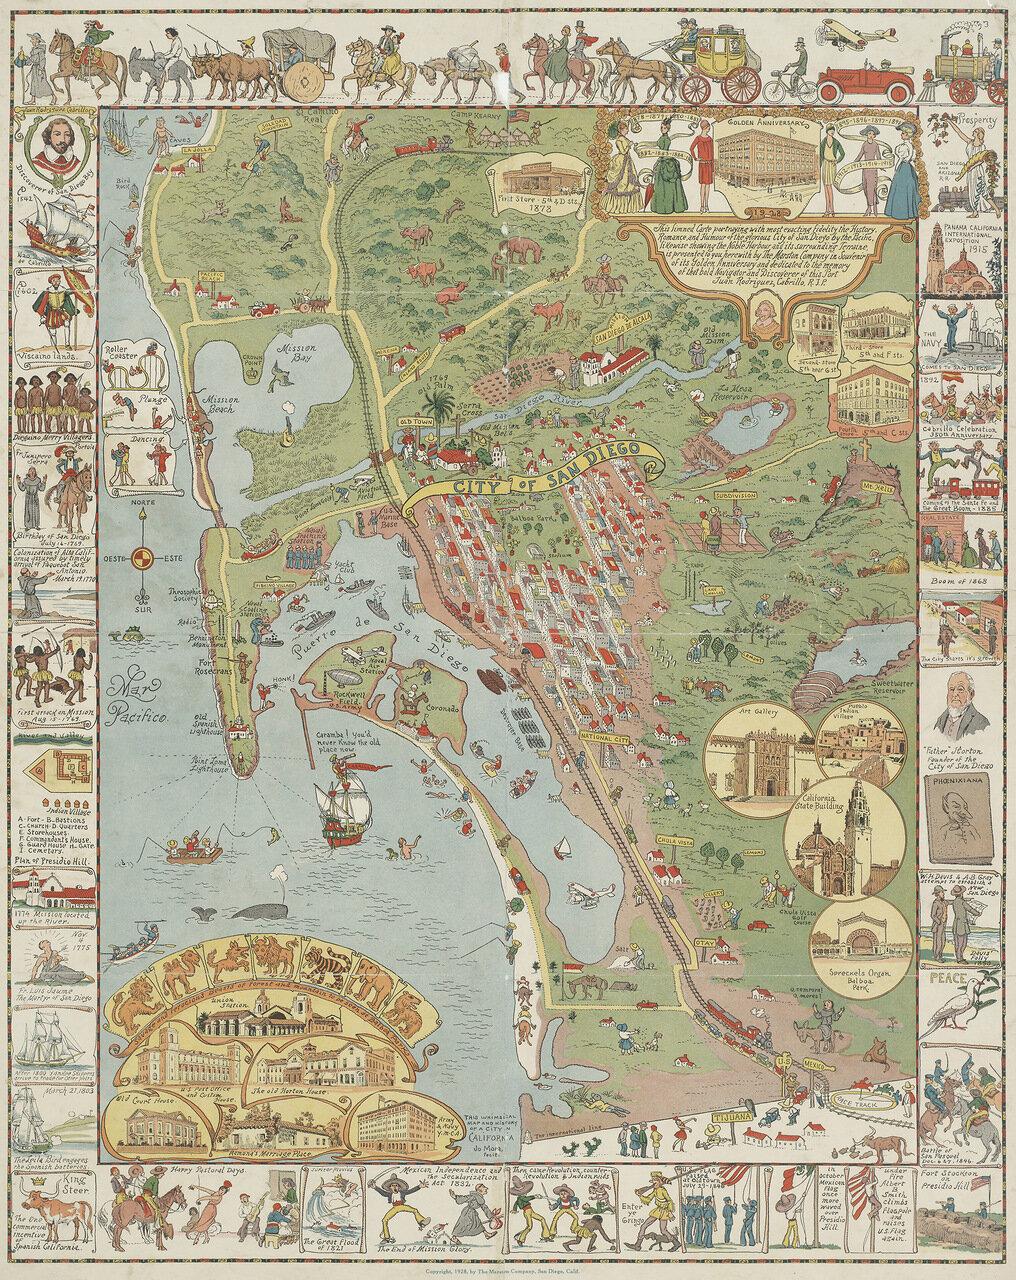 City of San Diego, Joseph Jacinto 'Jo' Mora, 1928